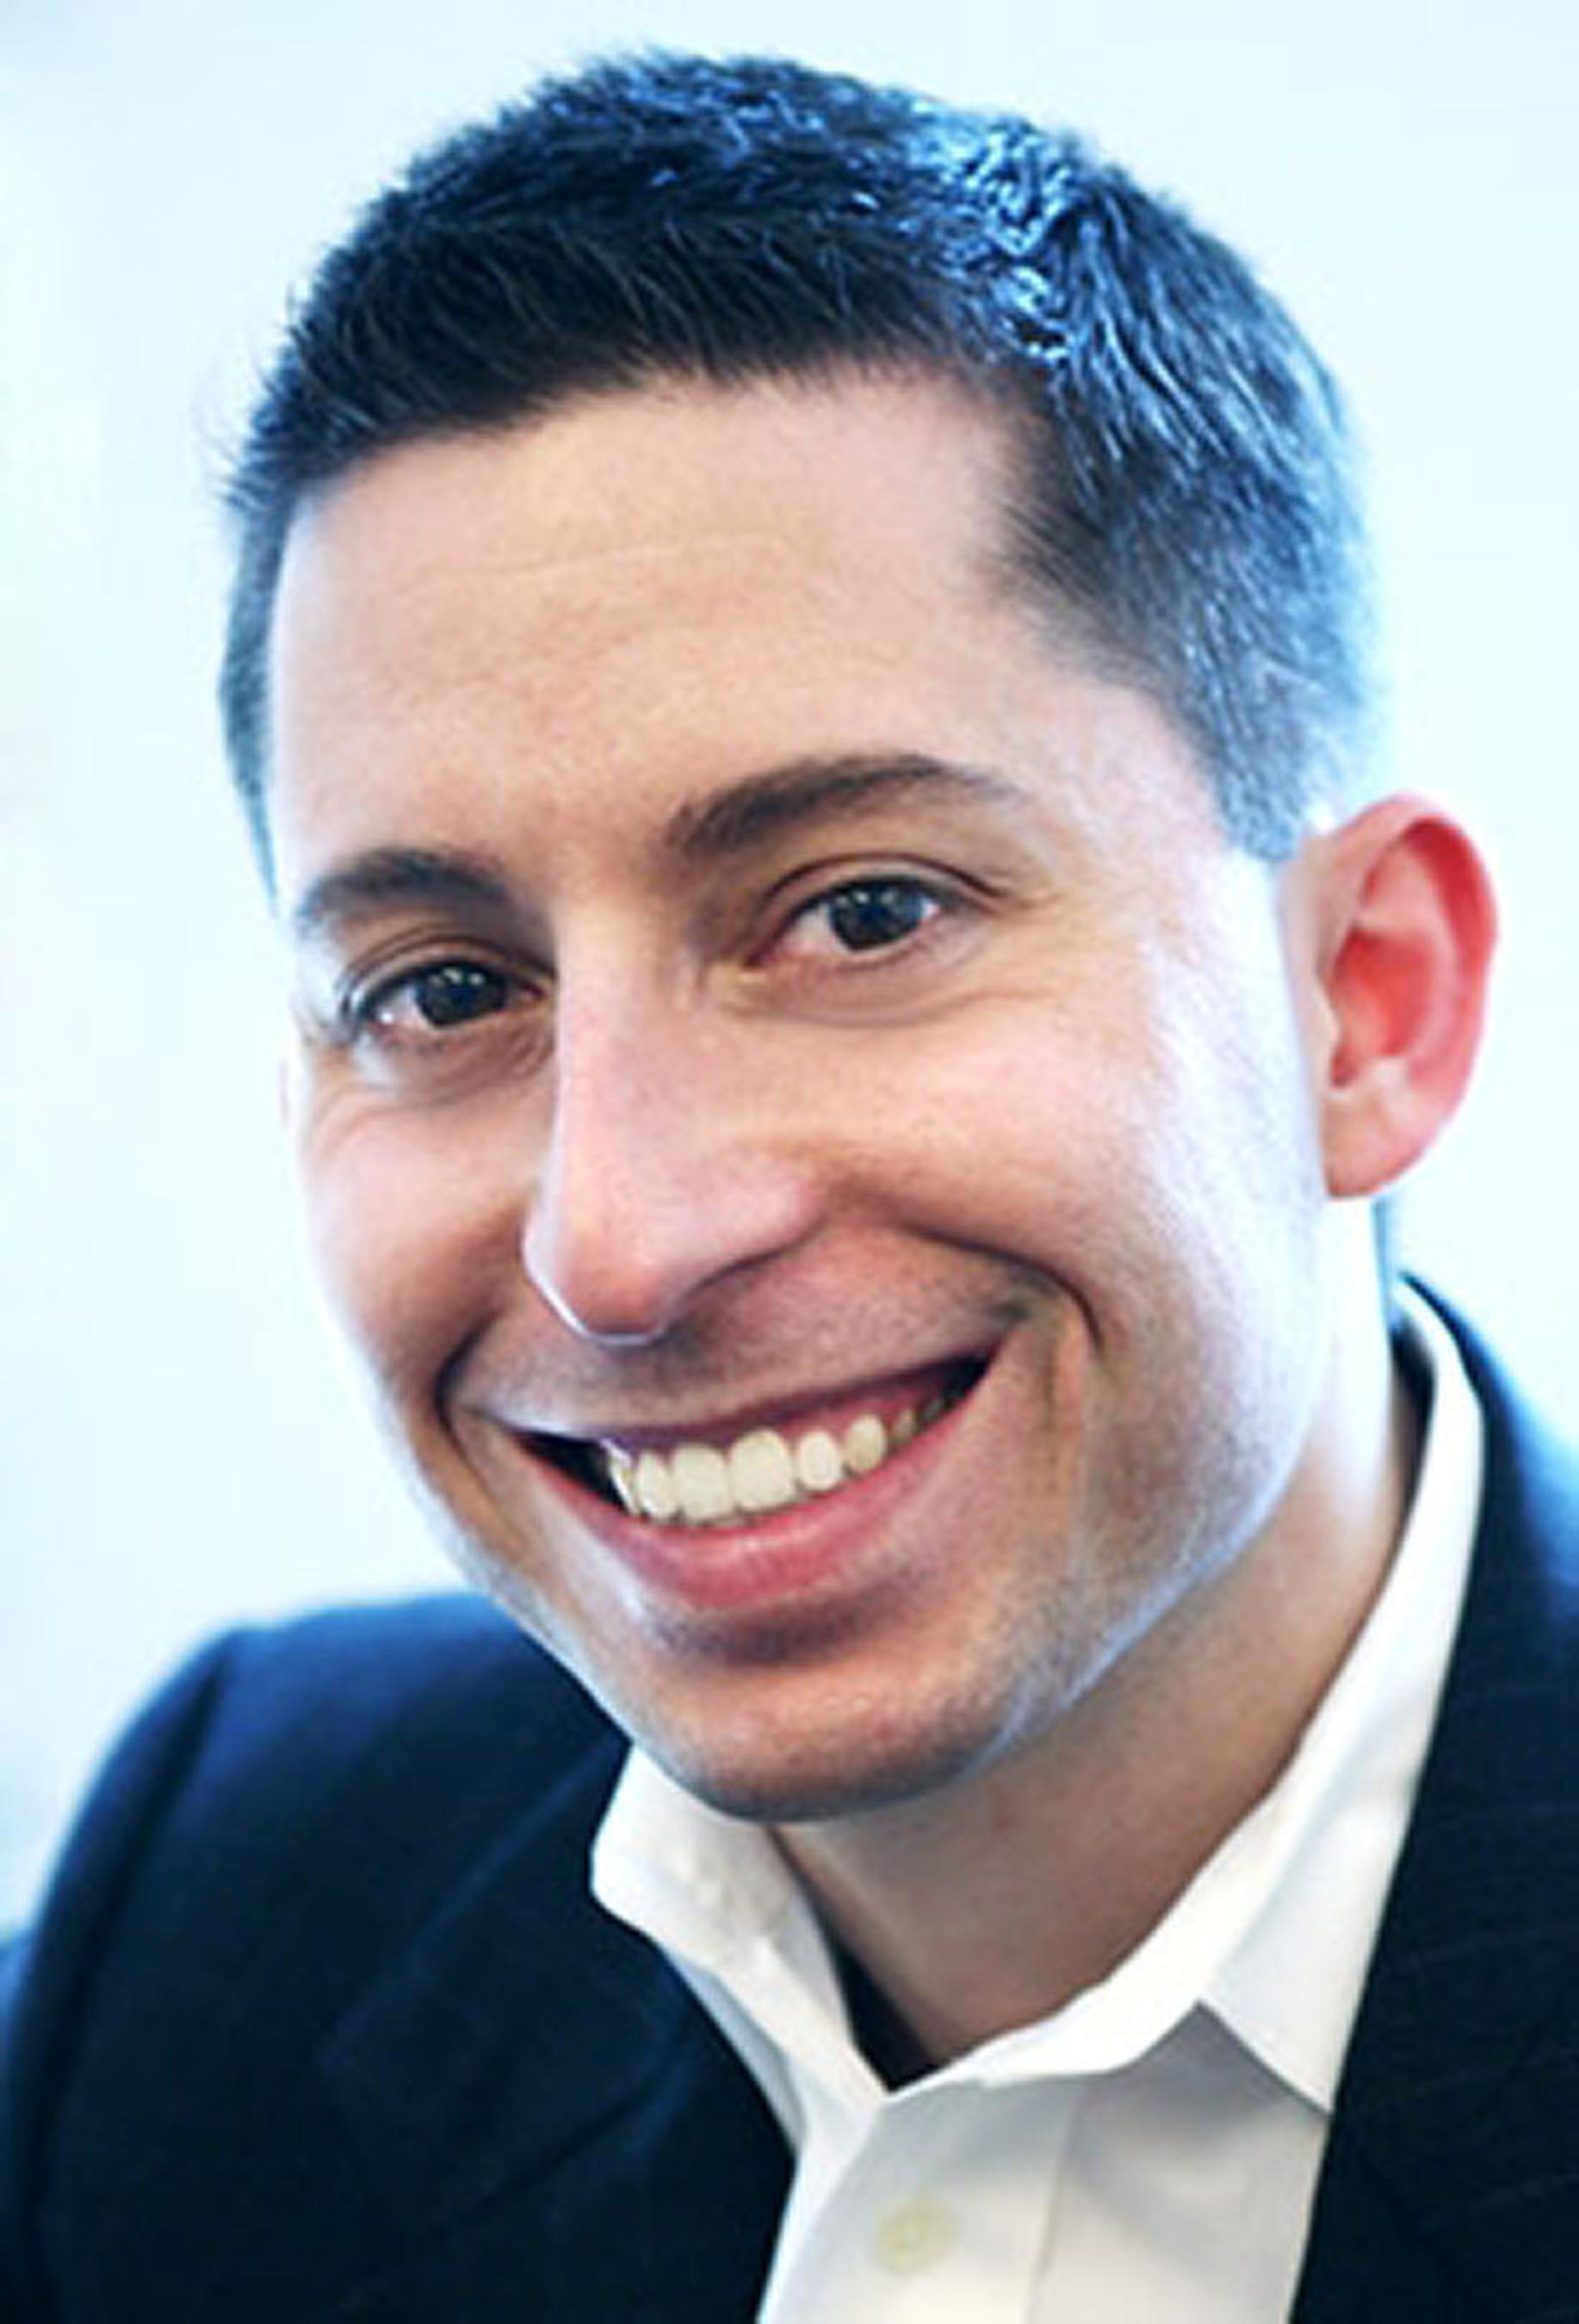 Michael Pranikoff, PR Newswire's Global Director of Emerging Media, to present at BOLO 2013. (PRNewsFoto/PR Newswire Association LLC)